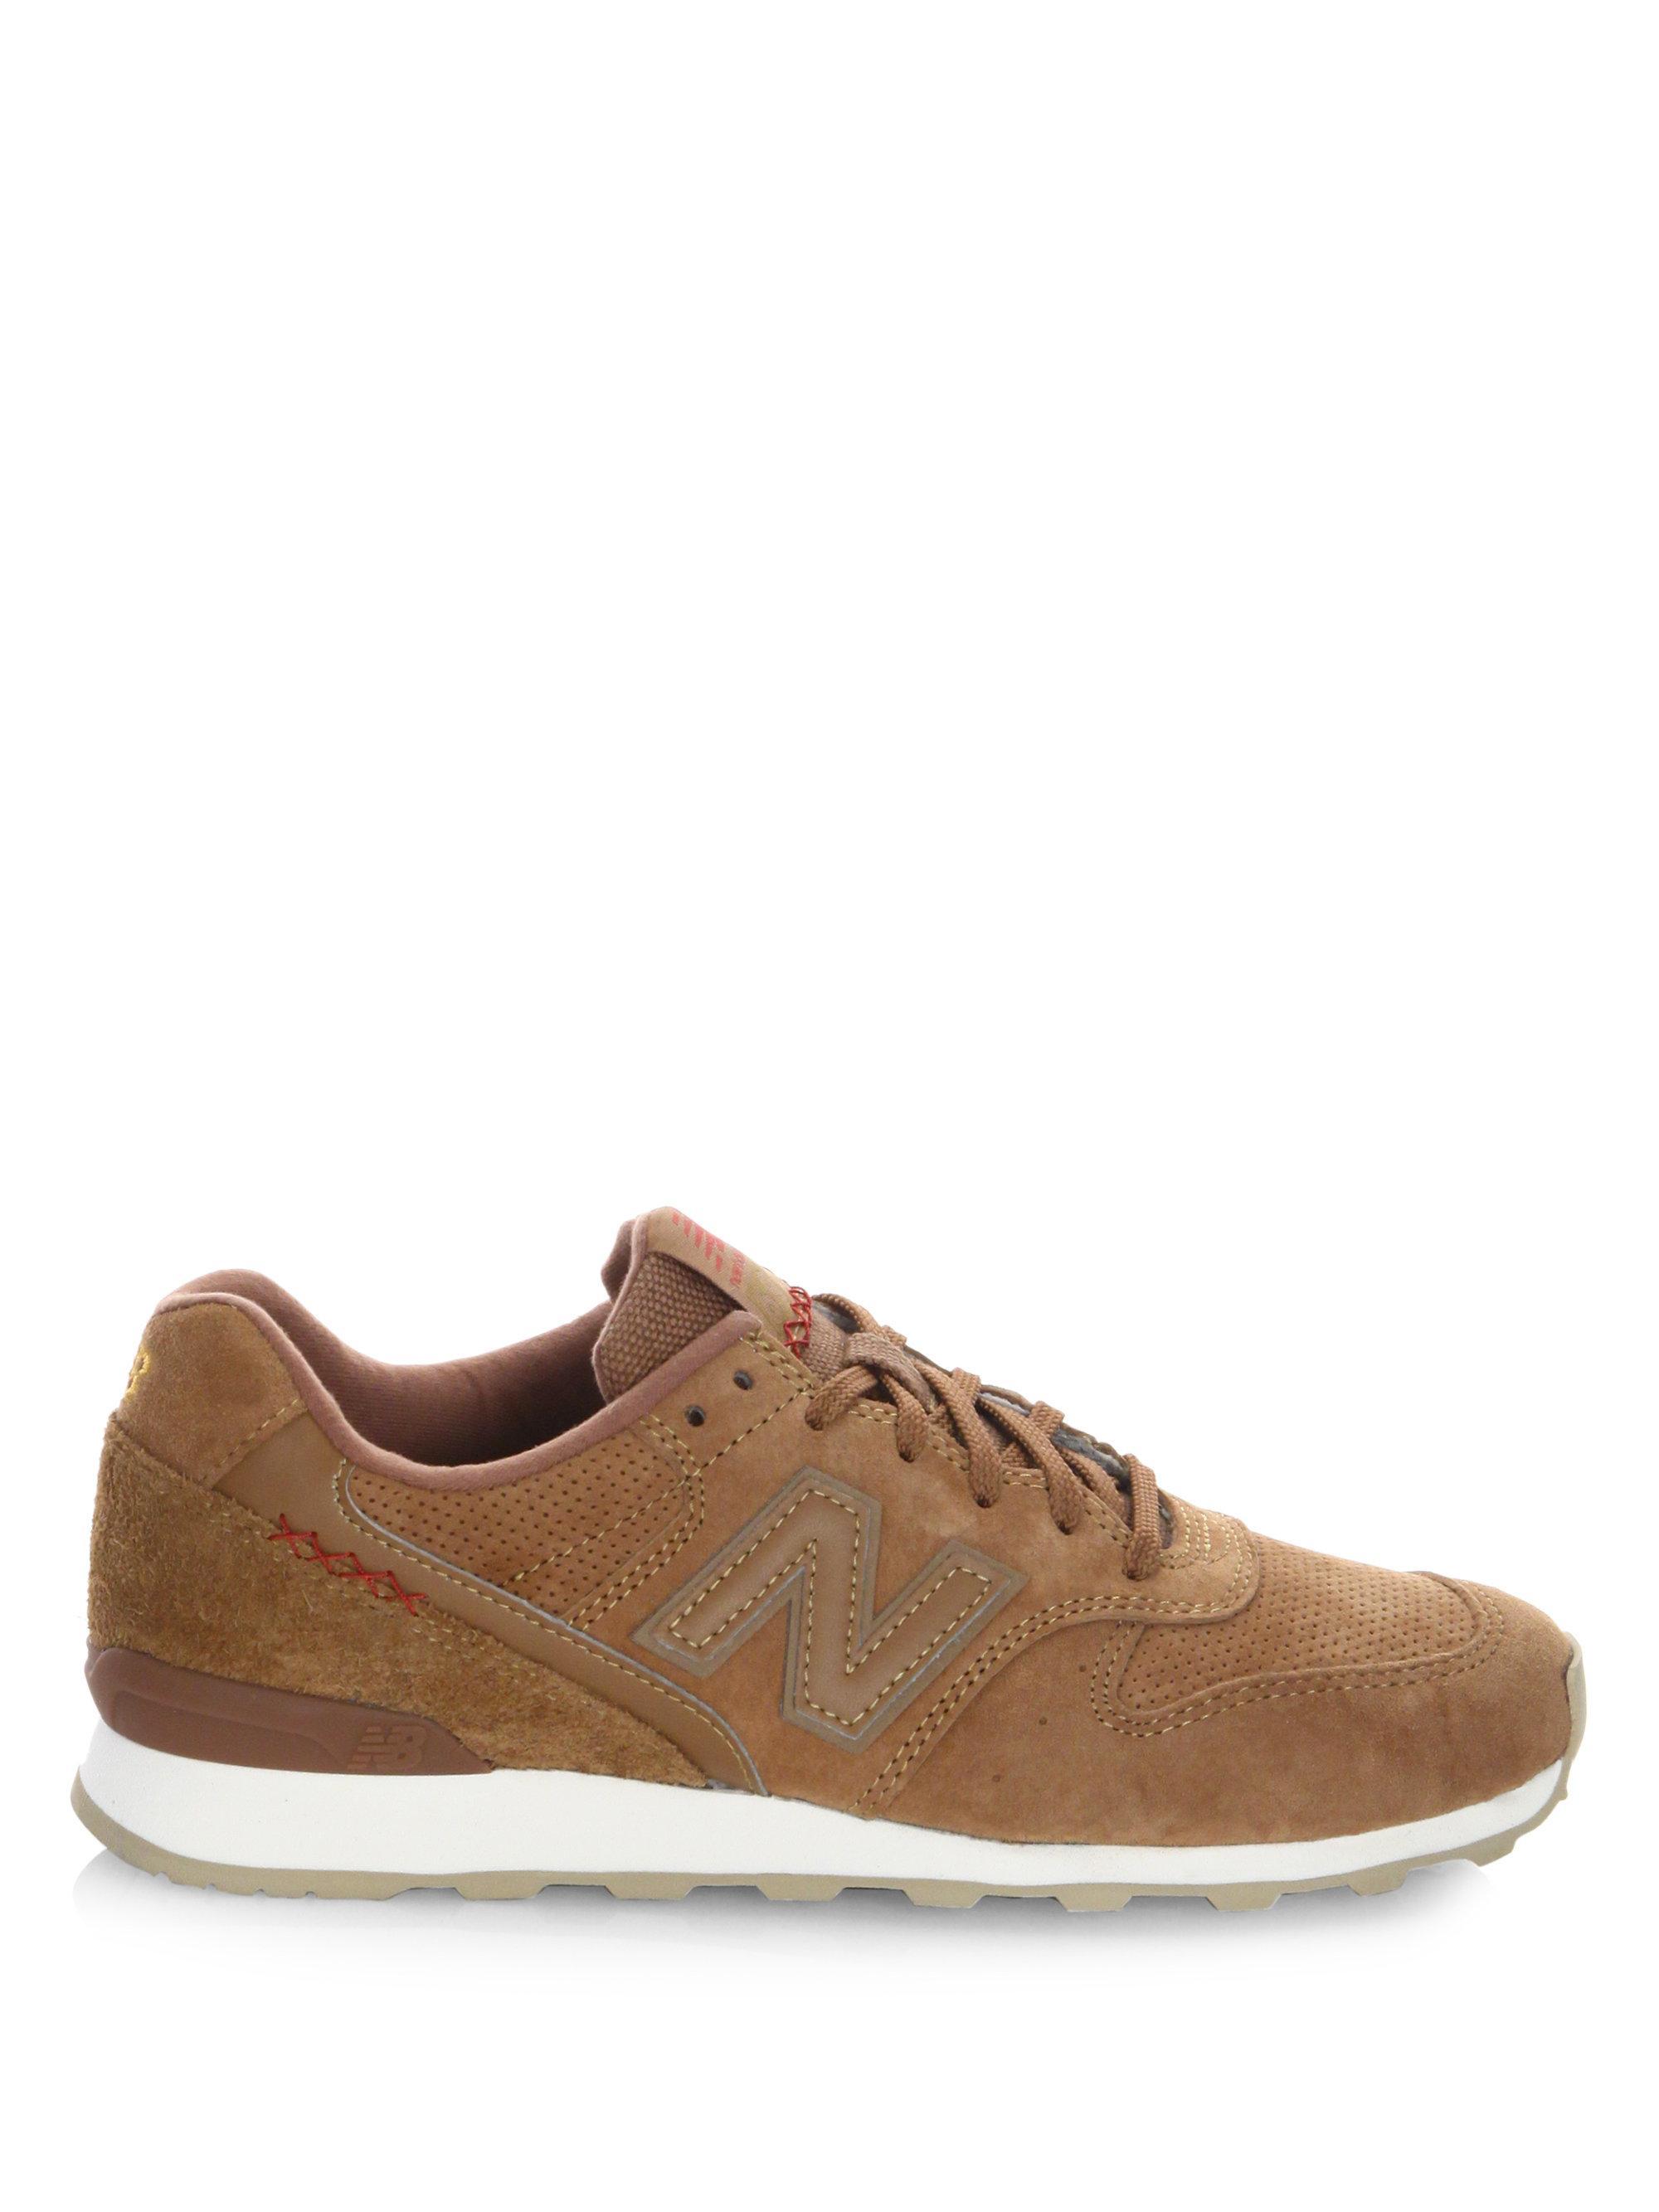 new balance 696 cinnamon